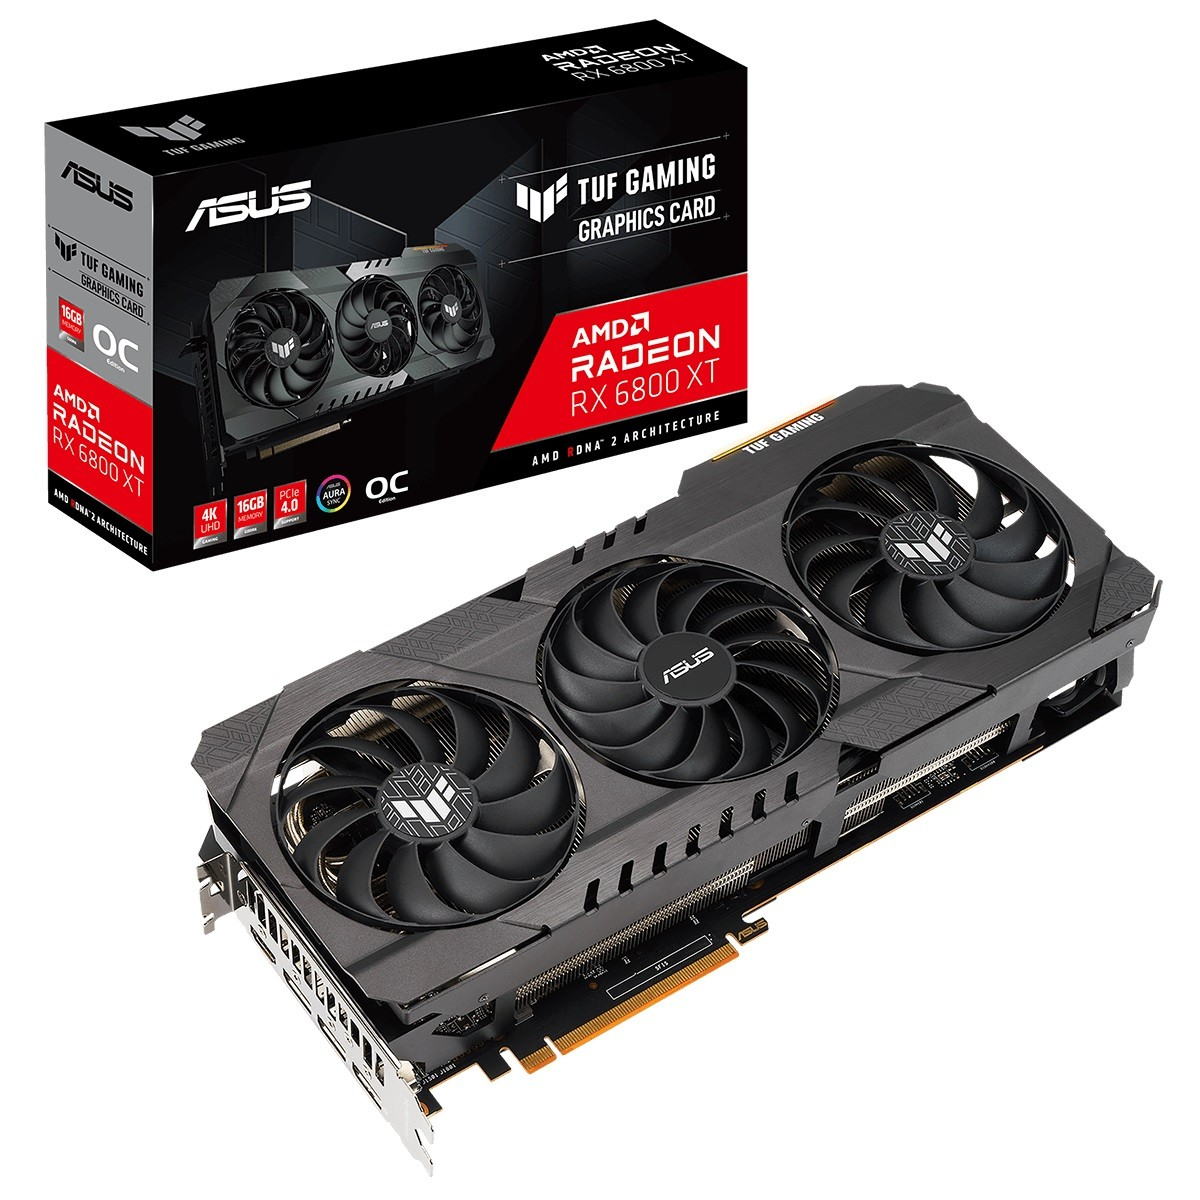 Kit Upgrade ASUS TUF Gaming Radeon RX 6800 XT + AMD Ryzen 7 3700X + Brinde Jogo Dirt 5